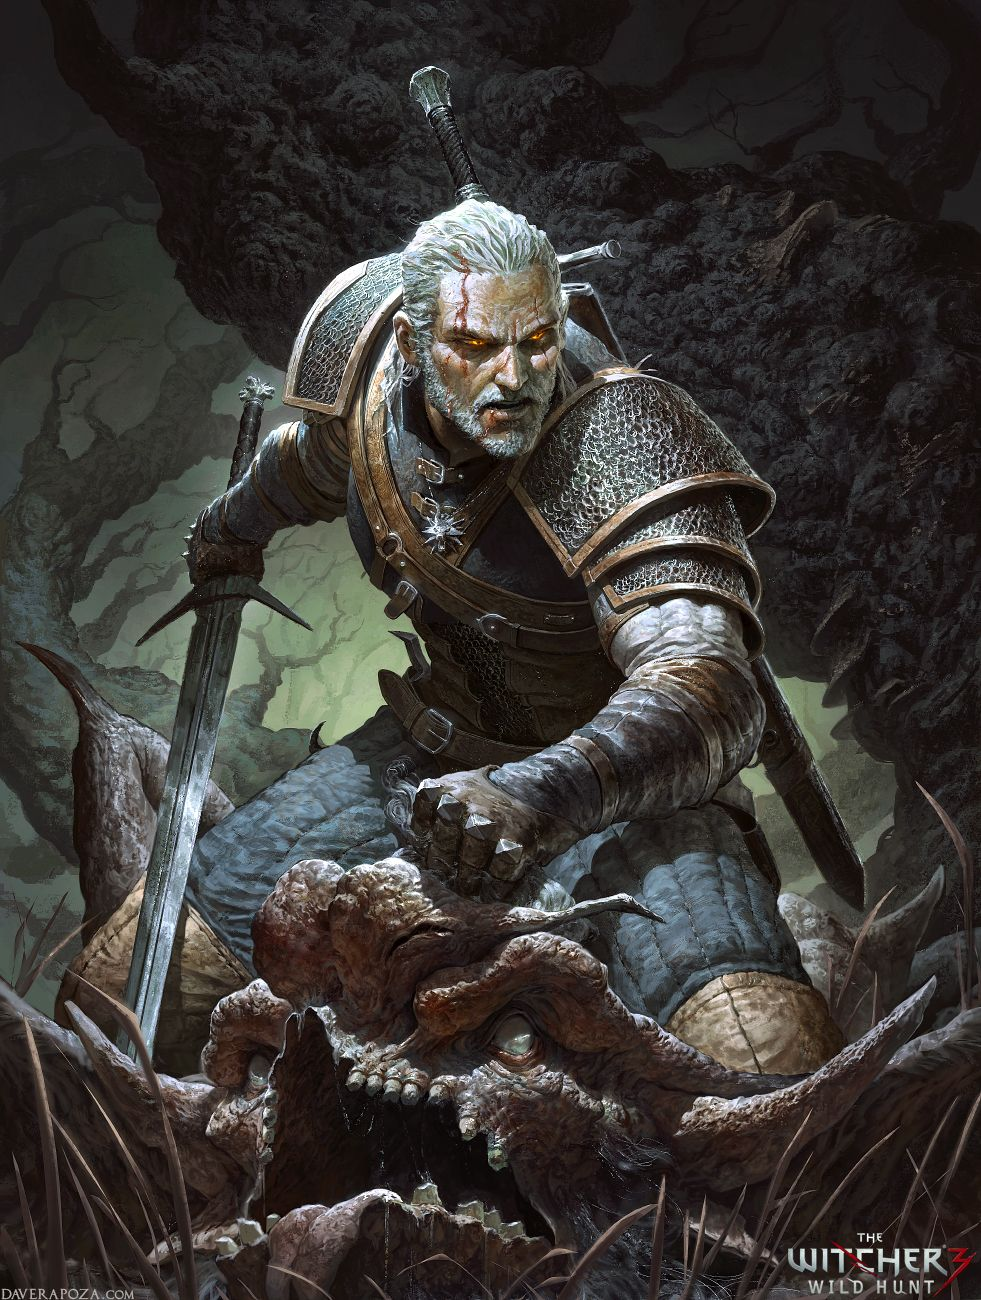 Wild Hunt General Concept Characters Art The Witcher 3 Wild Hunt The Witcher Wild Hunt The Witcher Wild Hunt